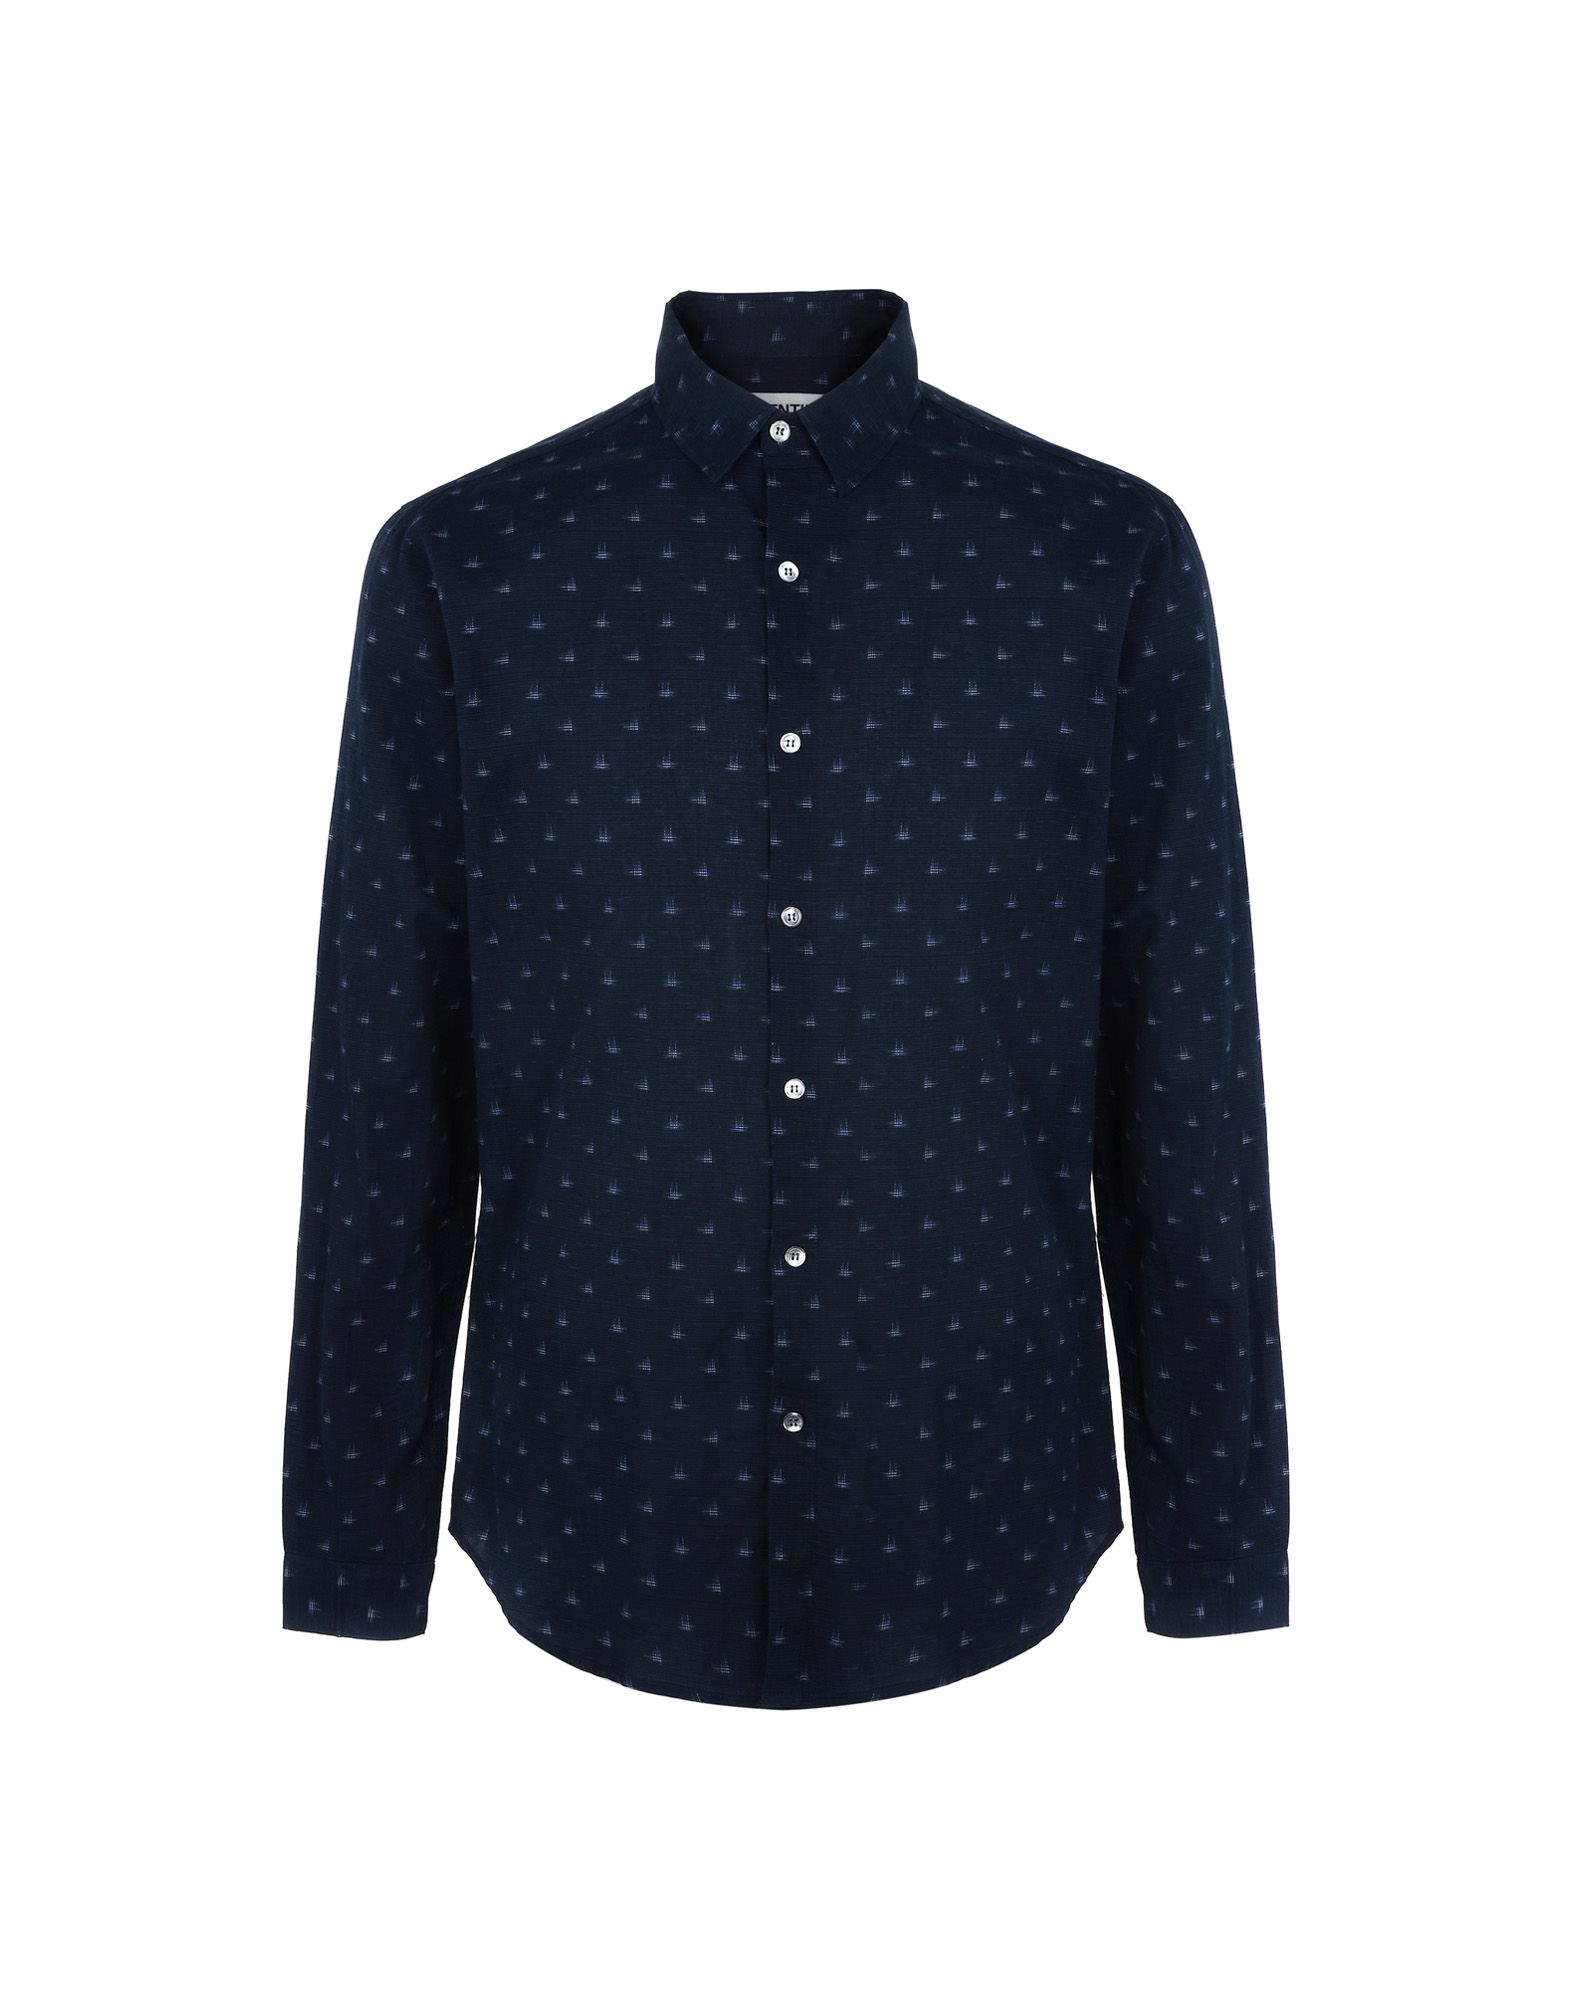 Camicia Fantasia Essentiel Antwerp M-Kabul Regular Fit Shirt - Uomo - Acquista online su